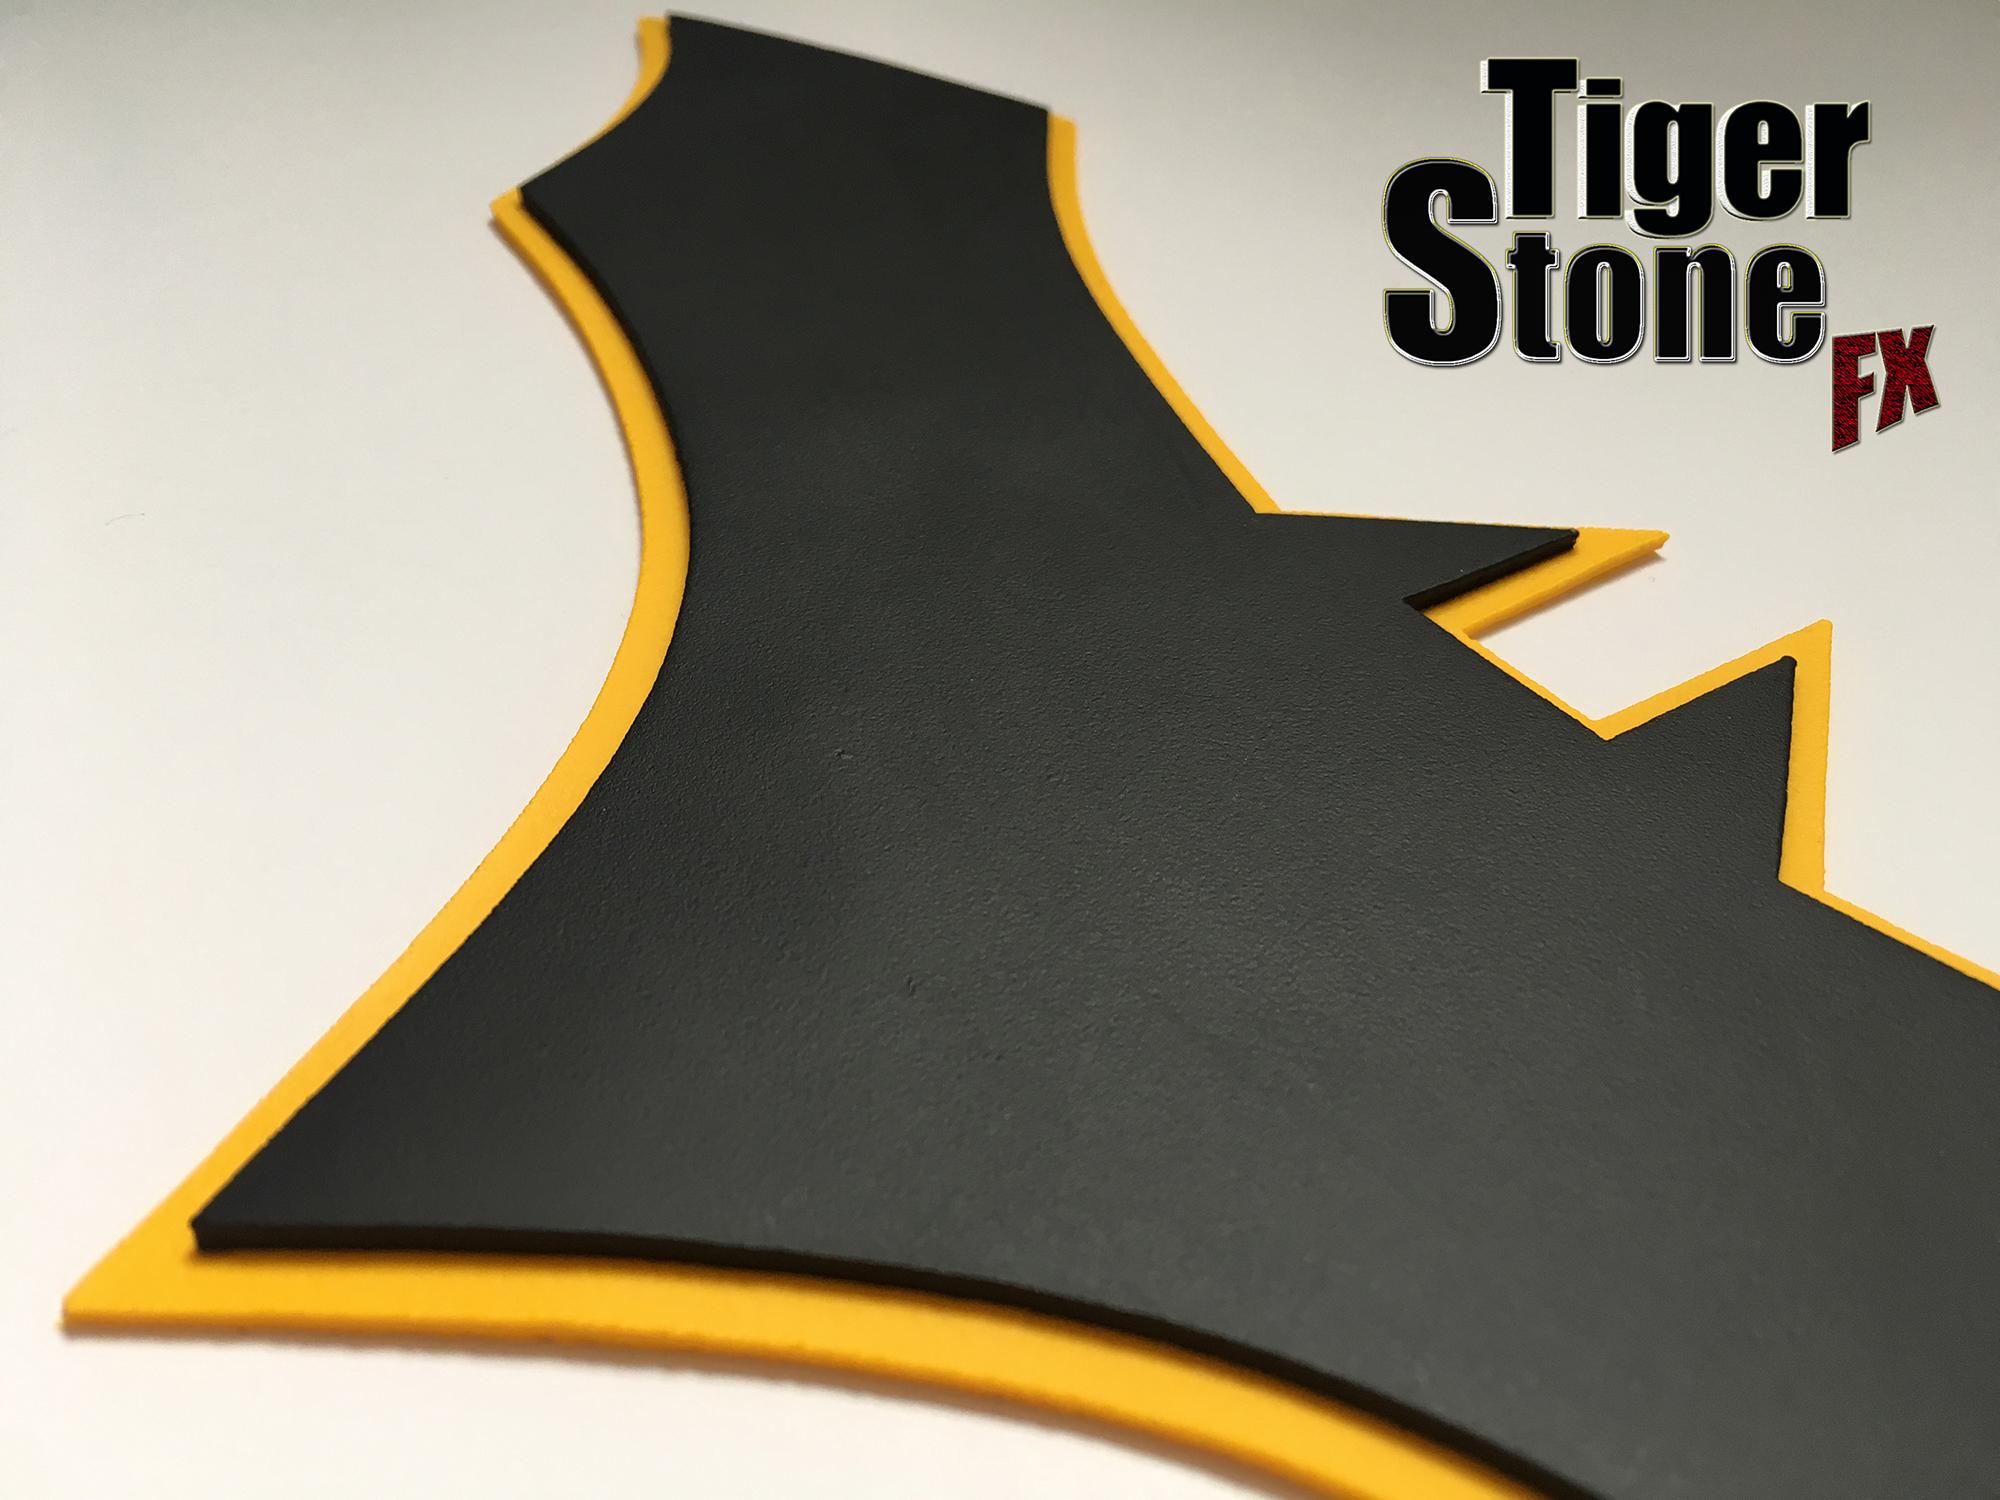 Batman Rebirth Comics Inspired Chest Emblem Tiger Stone Fx